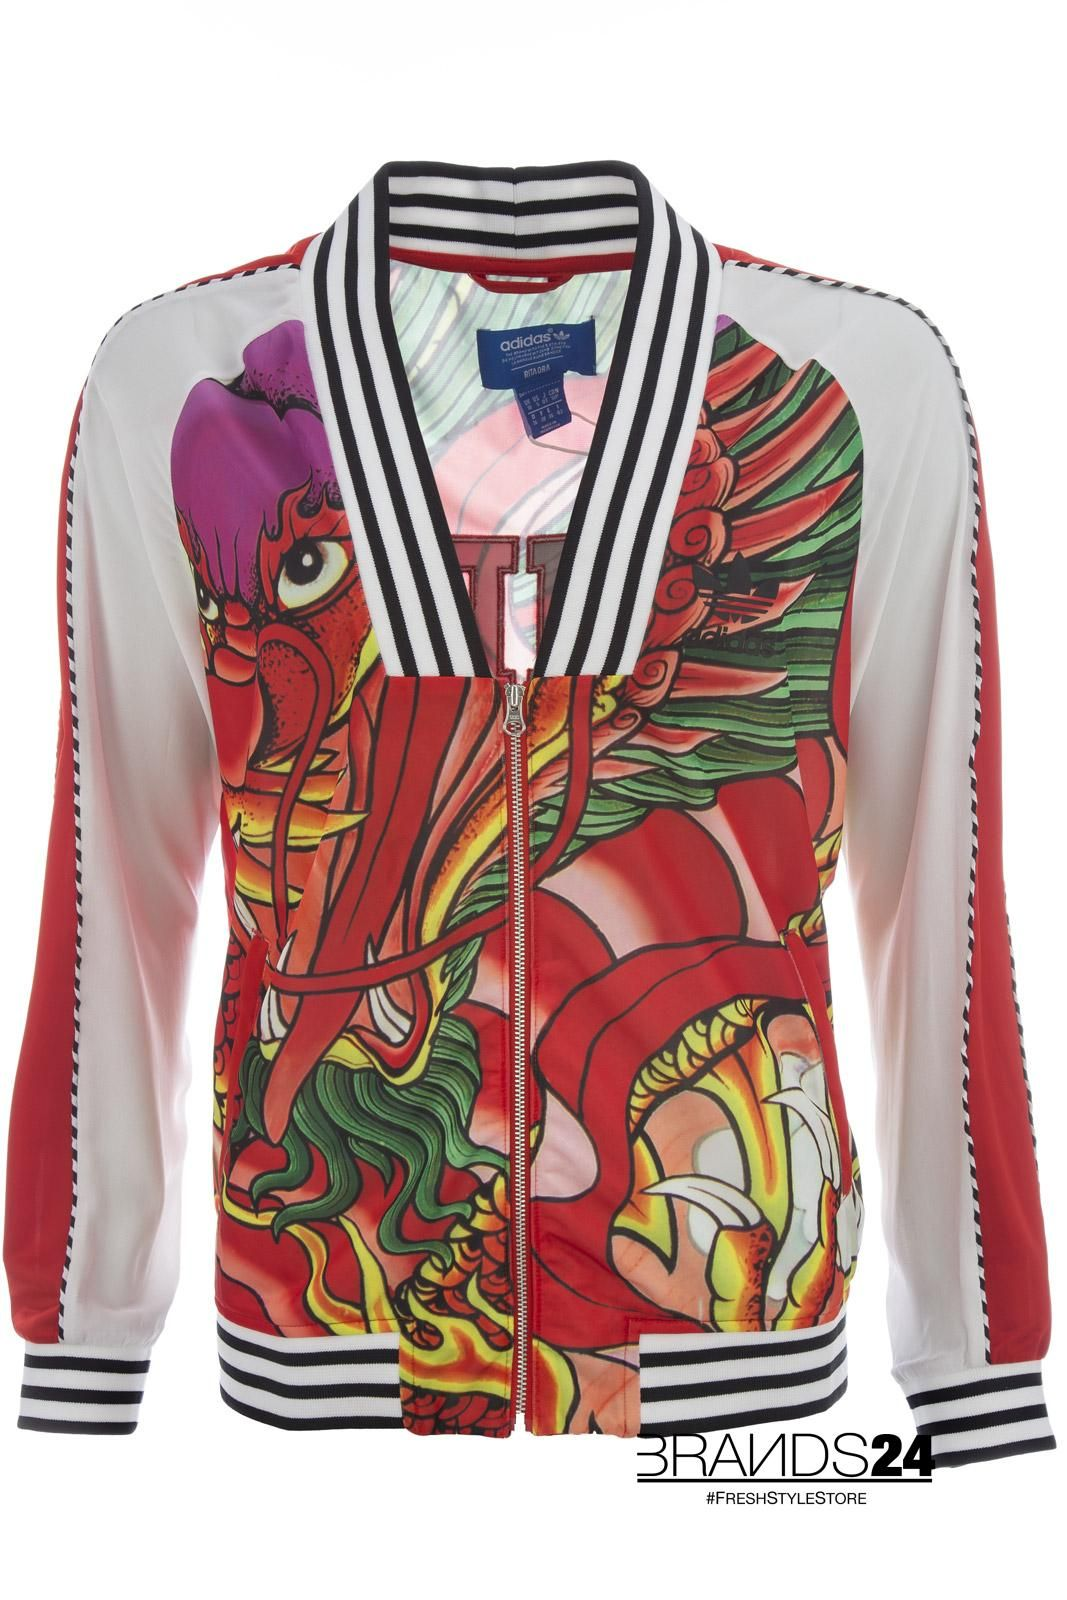 adidas dragon jacket